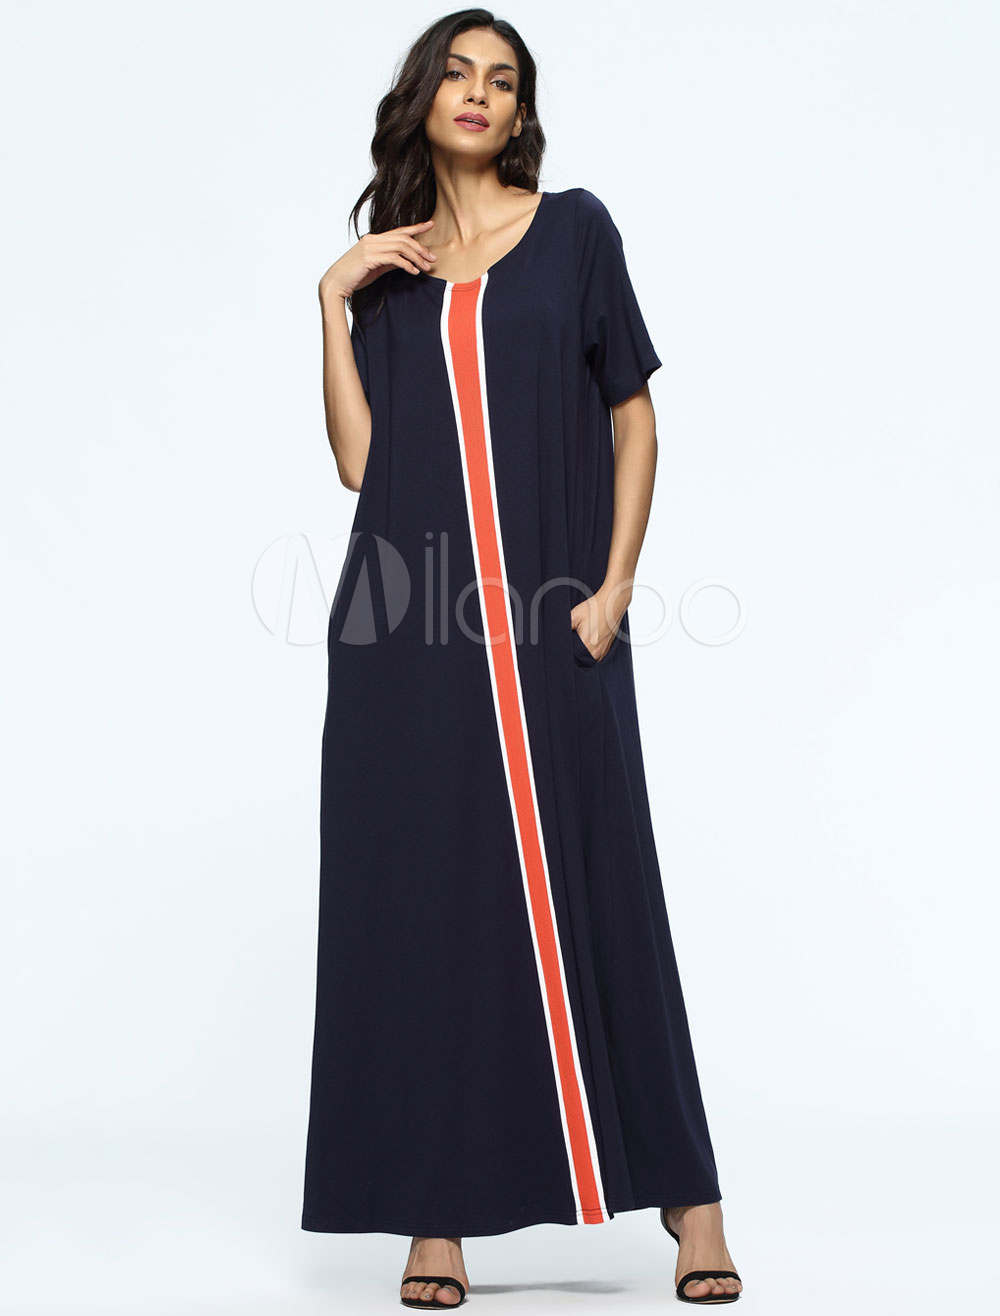 Black Muslim Abaya Dress Women Oversized Short Sleeve Maxi Dress (Women\\'s Clothing Arabian Clothing) photo